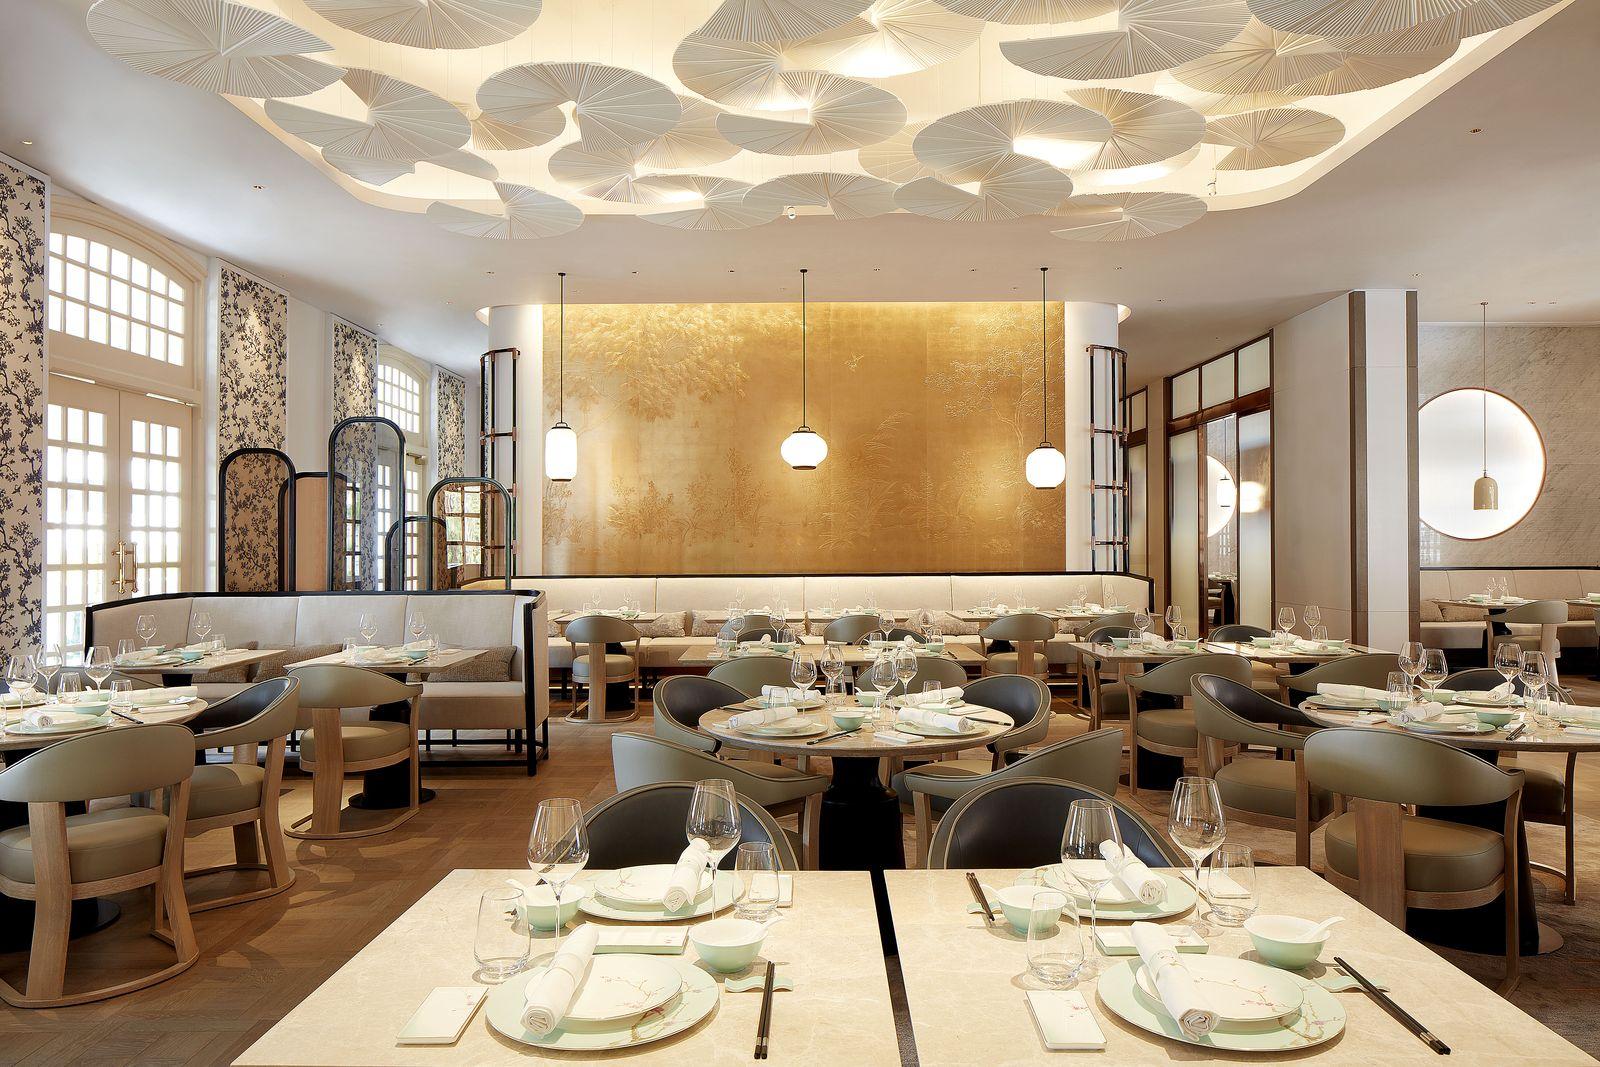 Raffles Hotel Singapore serves up modern Chinese cuisine at Yi by Jereme Leung